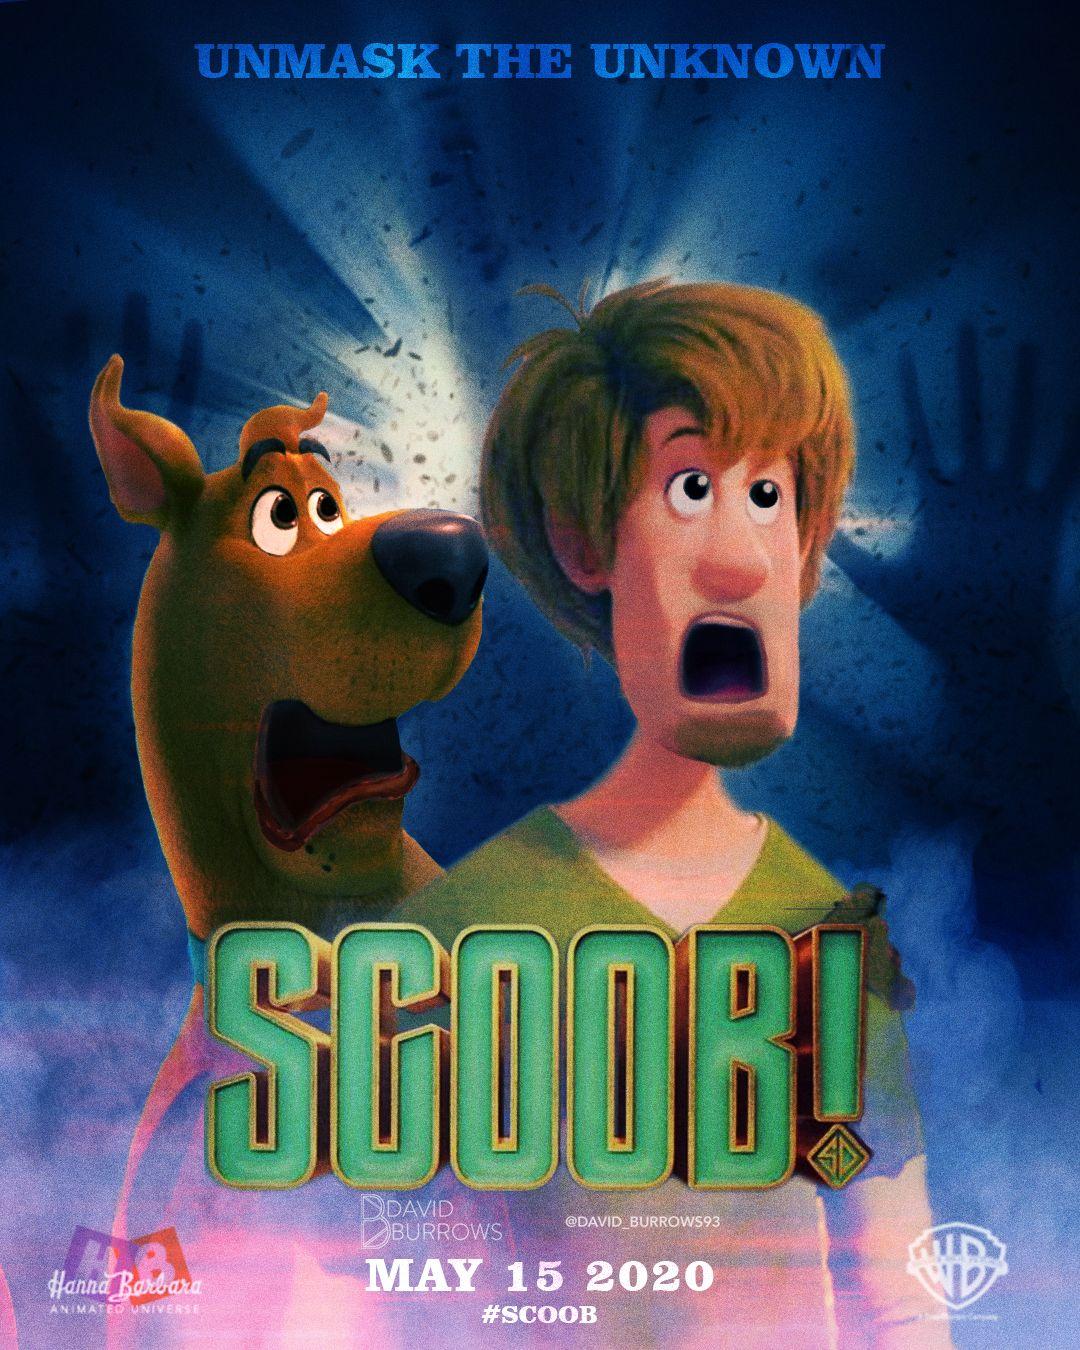 Regarder Fantasy Island 2020 Film Complet En Ligne Gratuit Scooby Doo Tv Show Free Movies Online Scooby